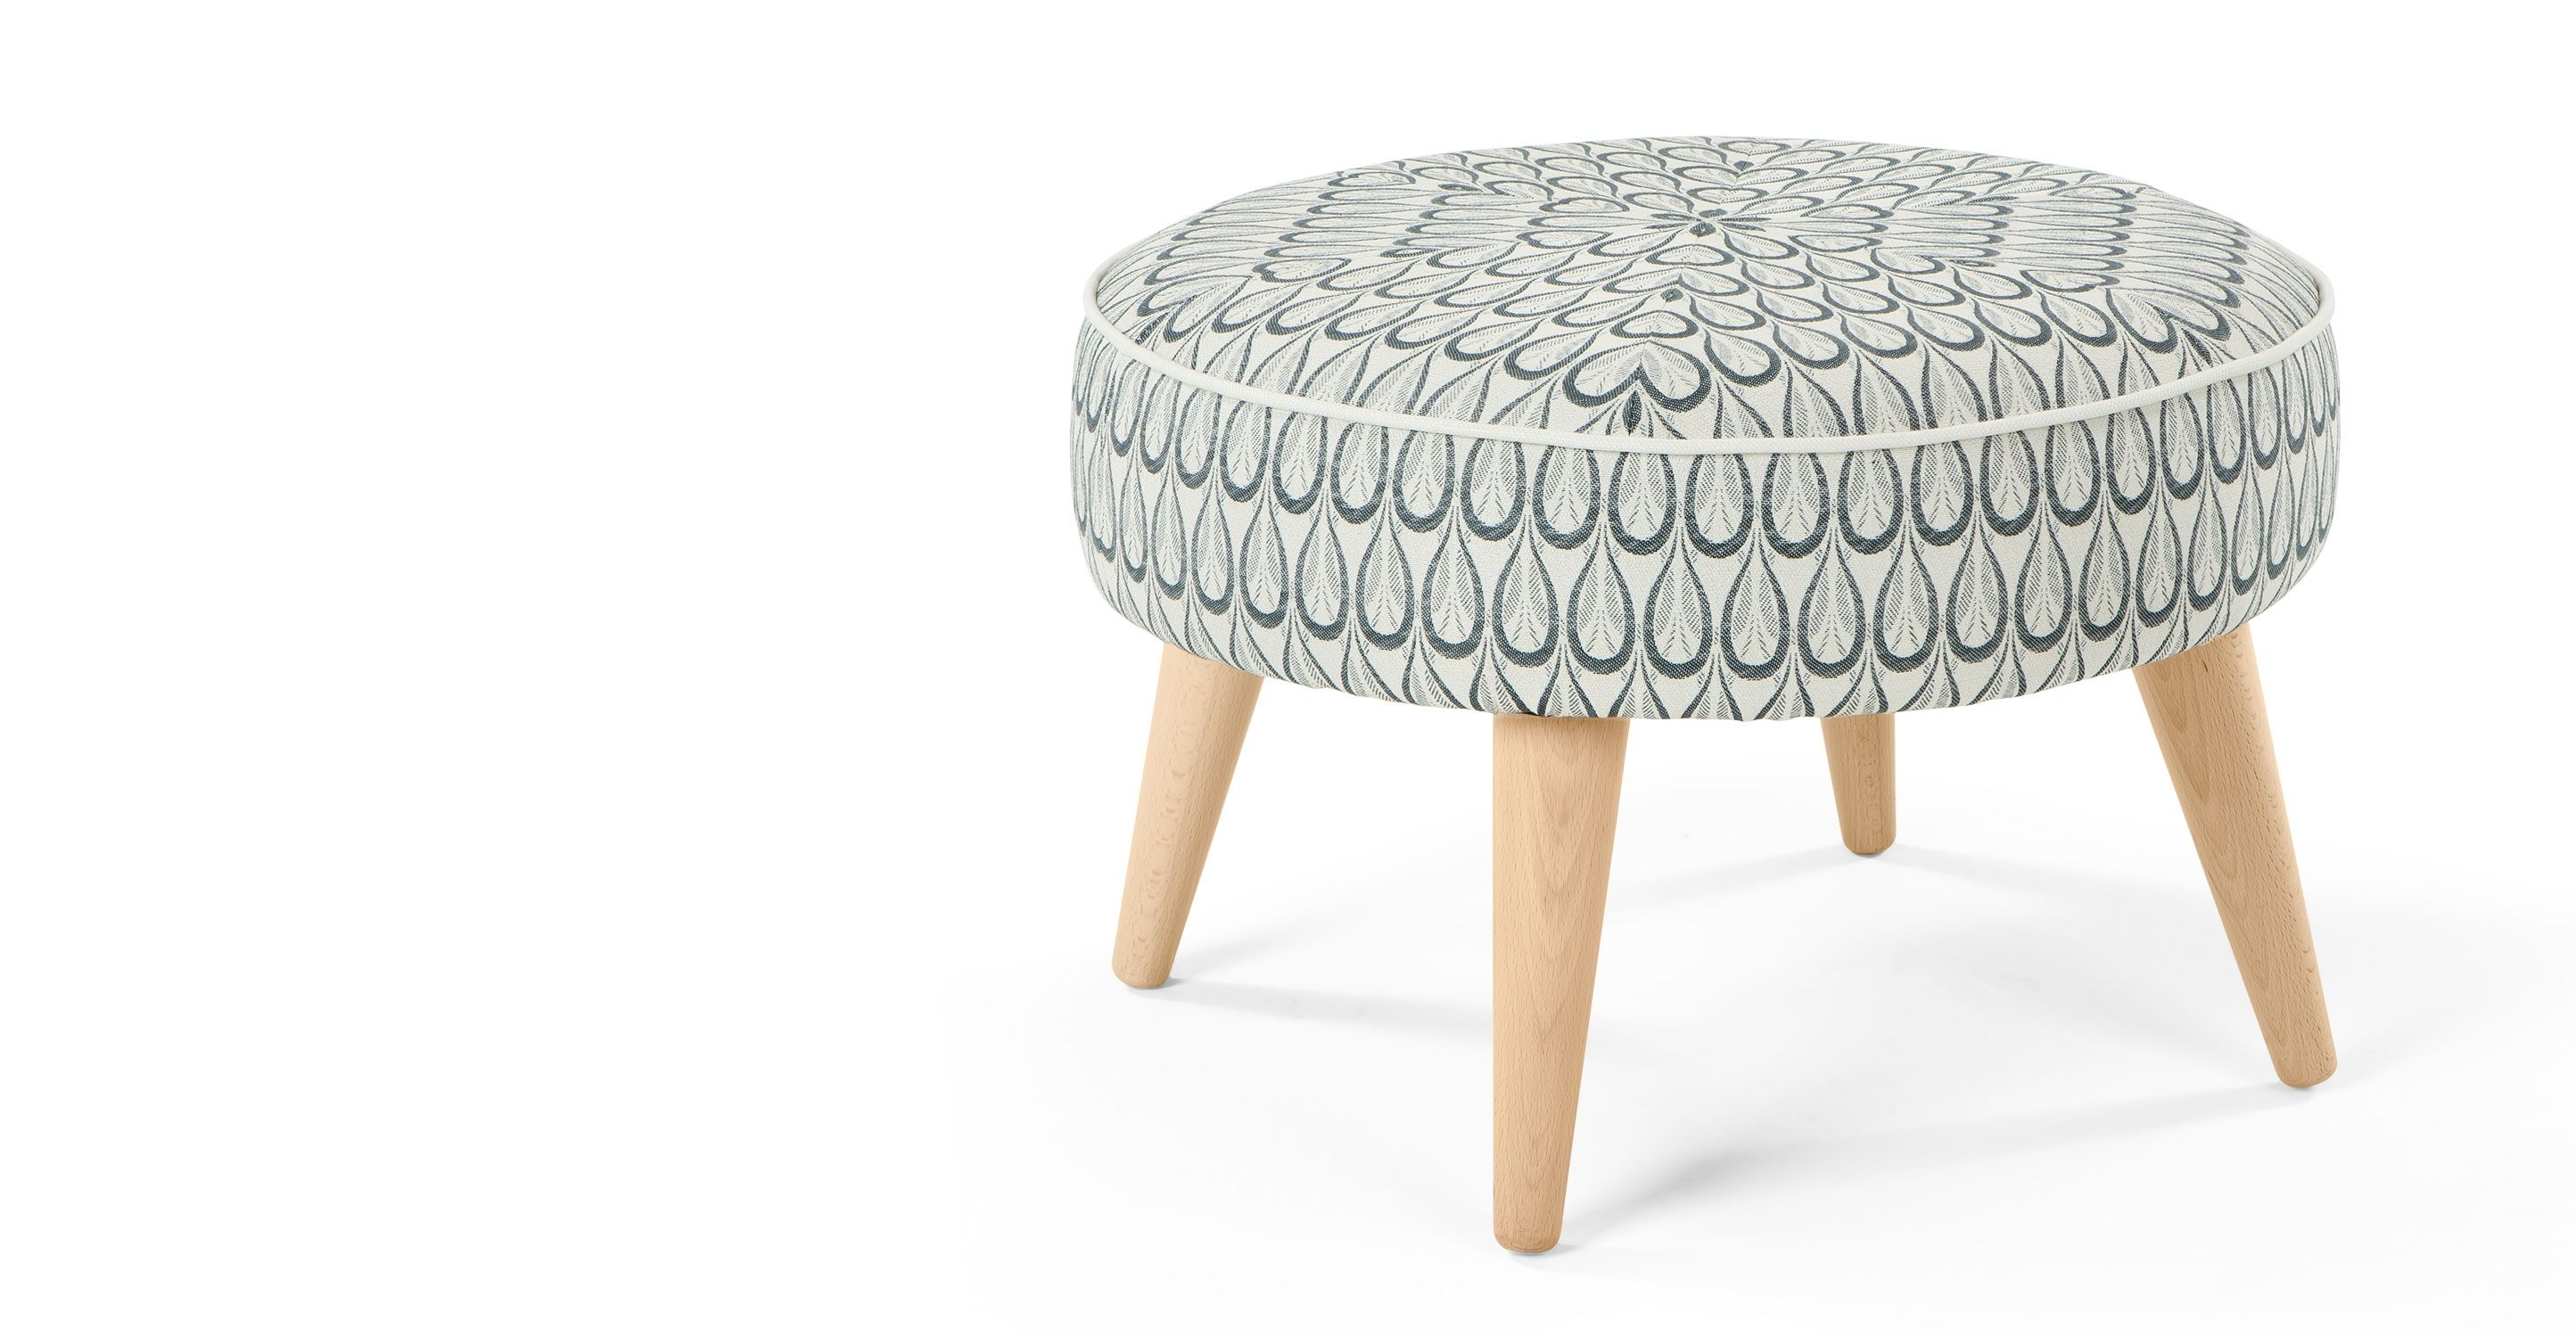 Lulu Footstool In Drop Weave Made Com Grey Footstool Lounge